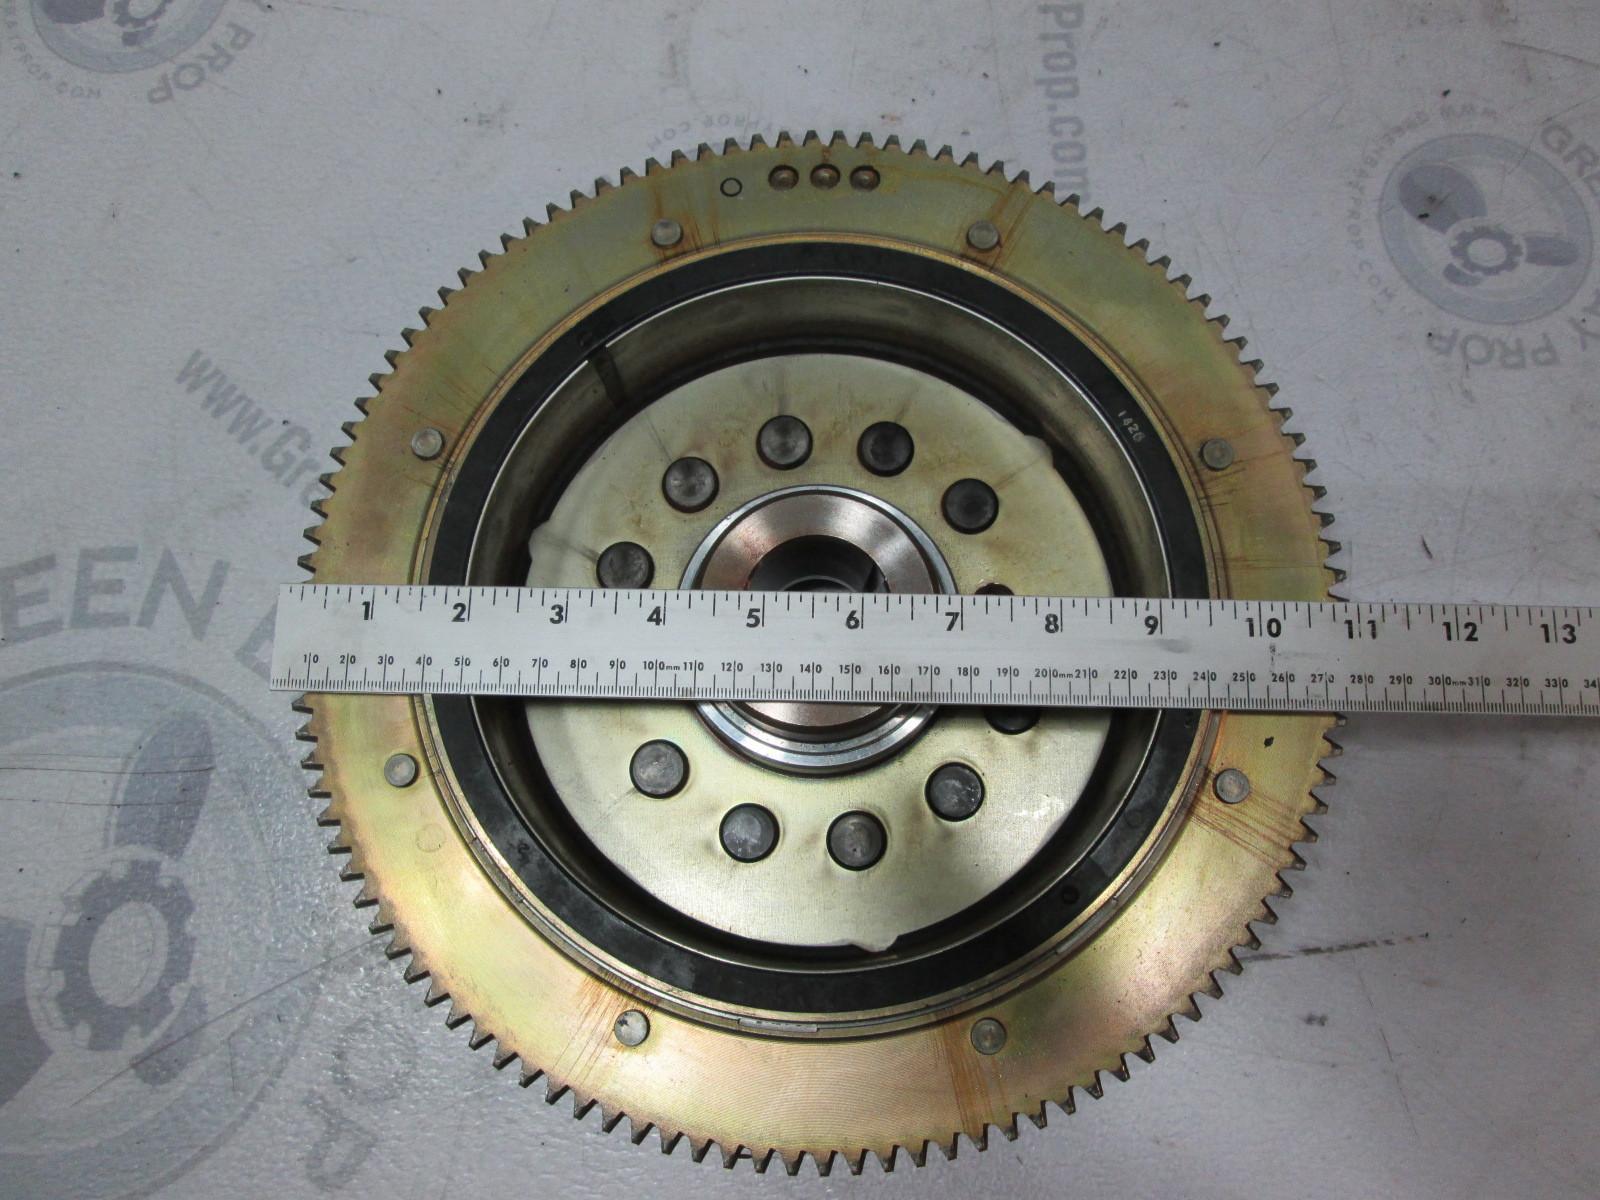 61A-85550-01-00  Flywheel Rotor for Yamaha Outboard 200-250HP 1996-2005